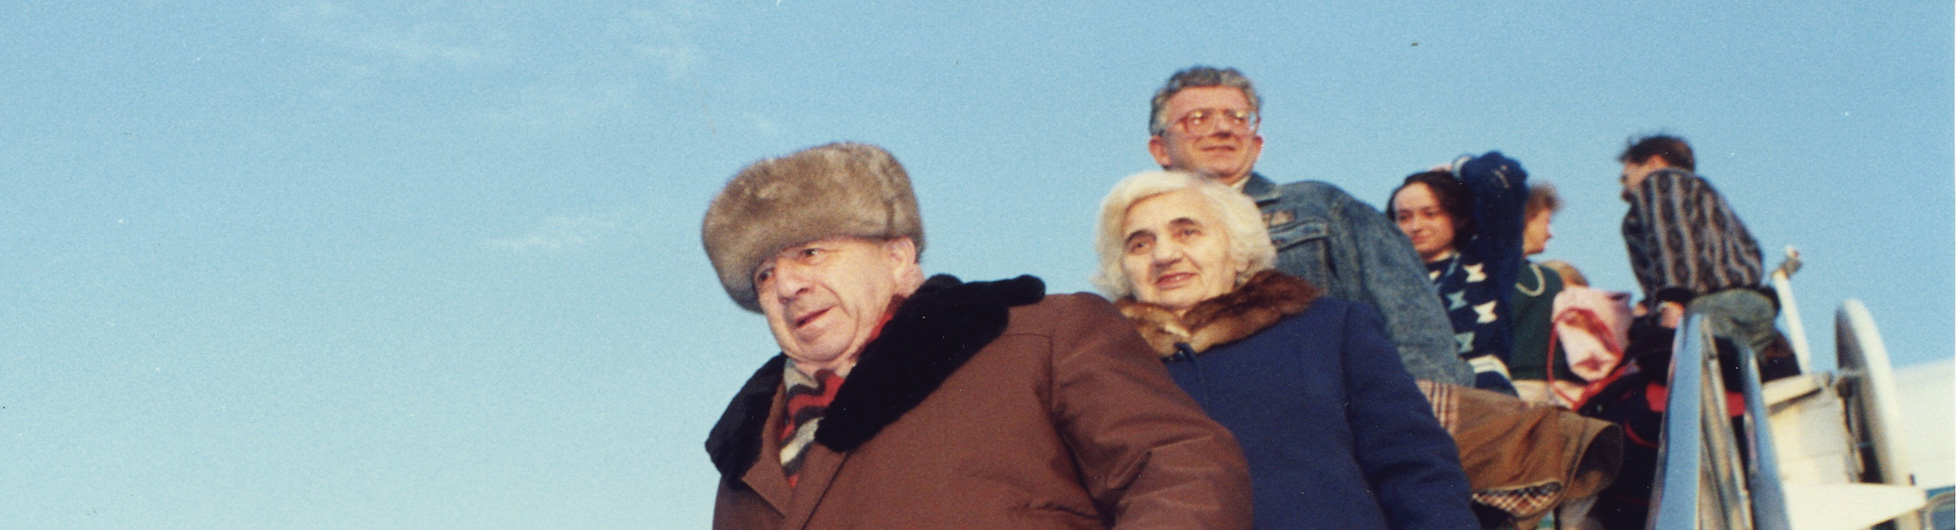 ICEJ_Soviet_Jews_arrivng_1990s